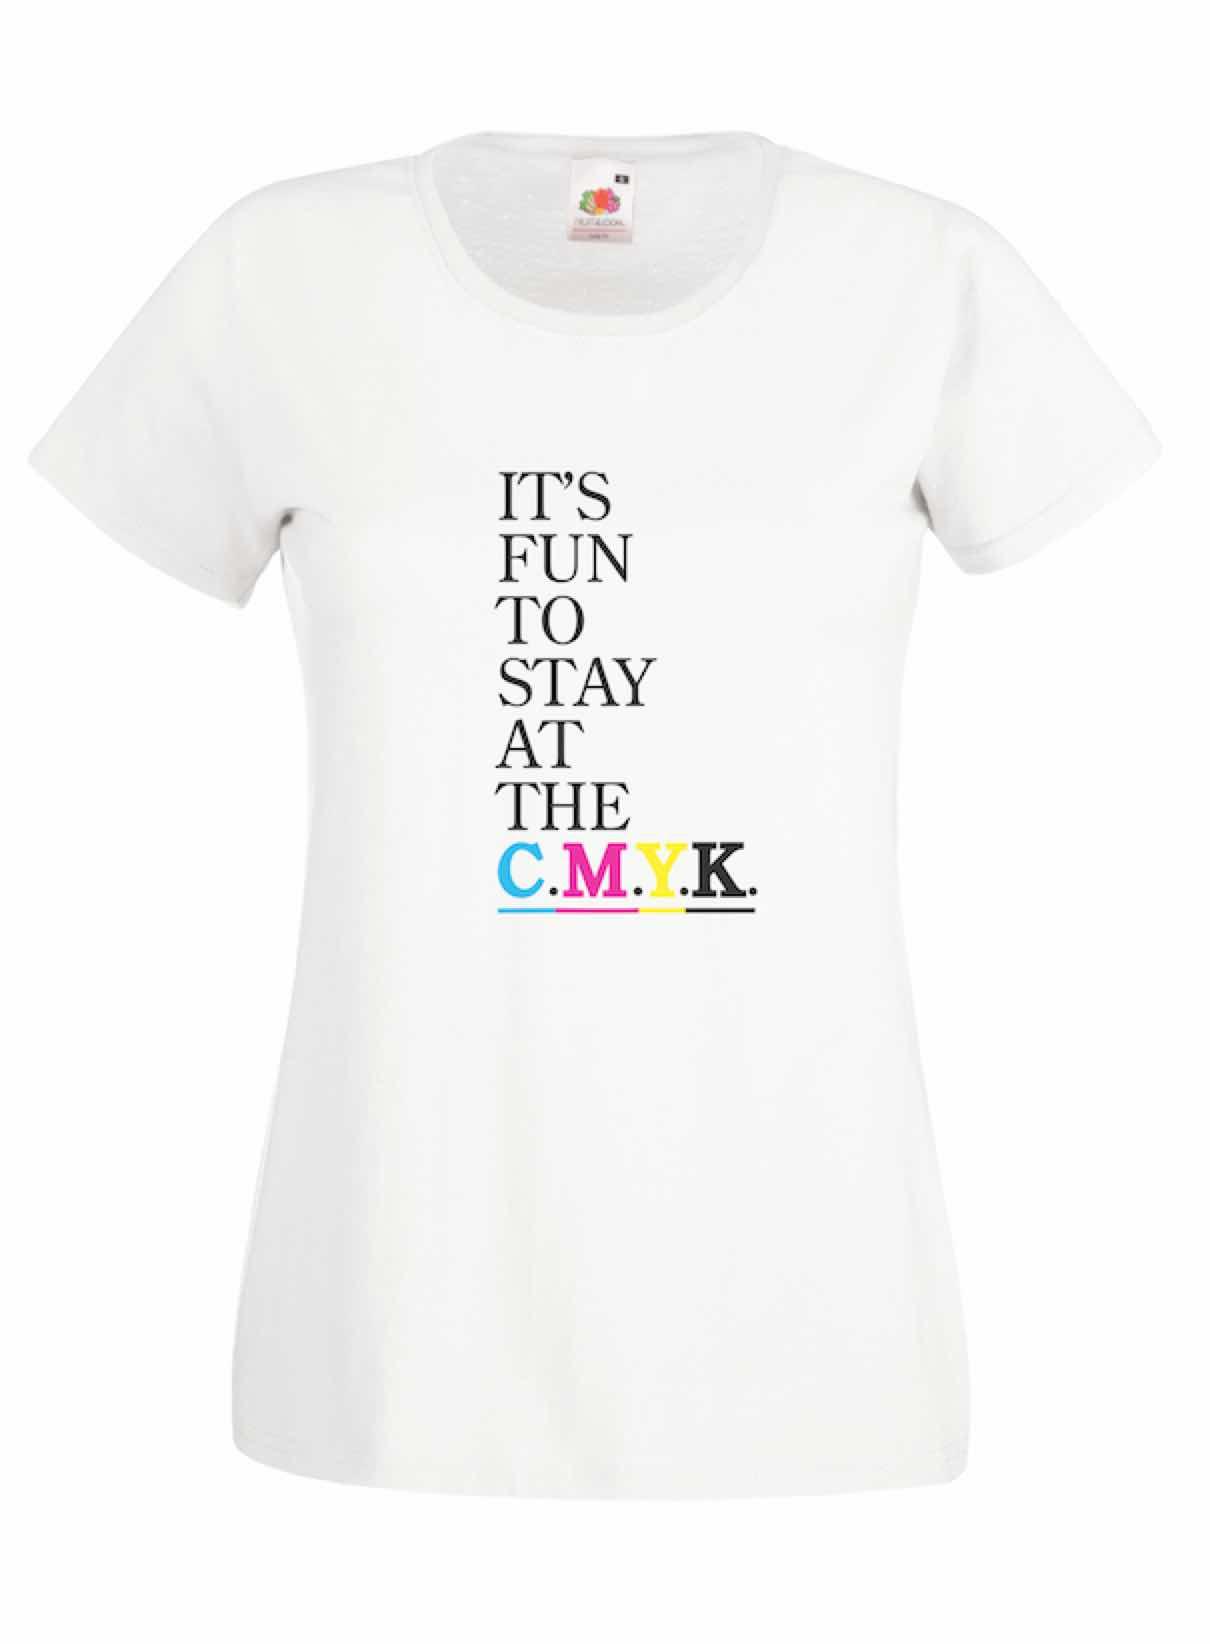 CMYK design for t-shirt, hoodie & sweatshirt